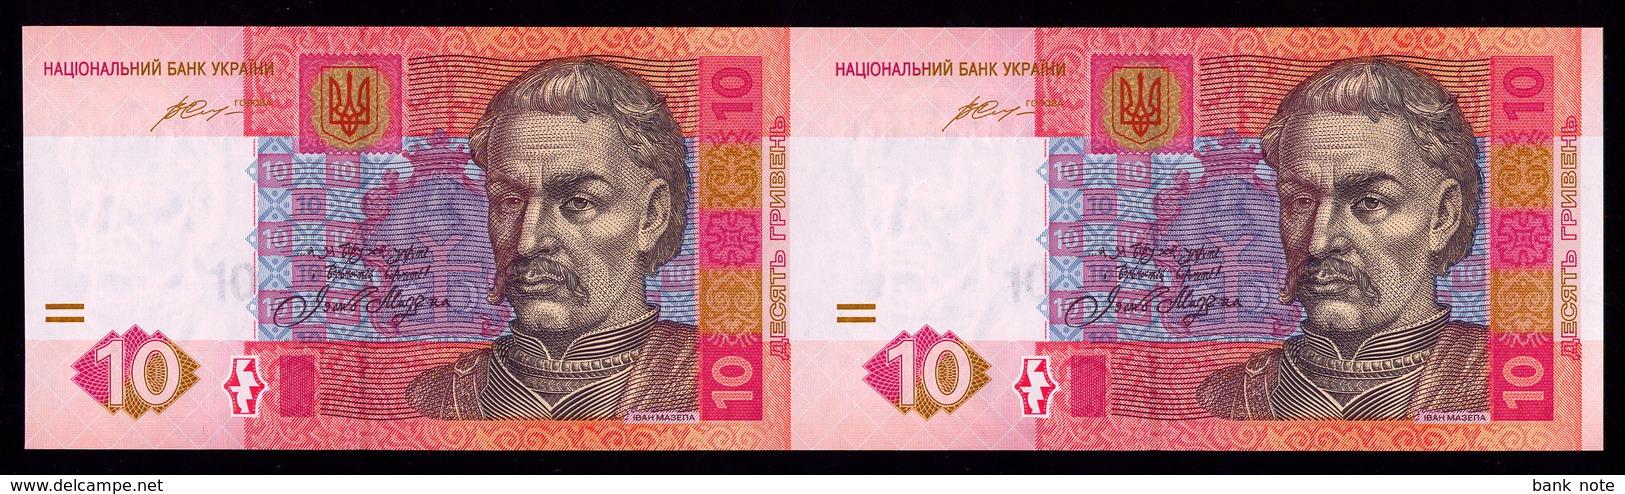 UKRAINE 10 HRYVEN 2015 UNCUT PAIR / HORIZONTAL BLOCK OF 2 Pick 119Ad Unc - Ukraine